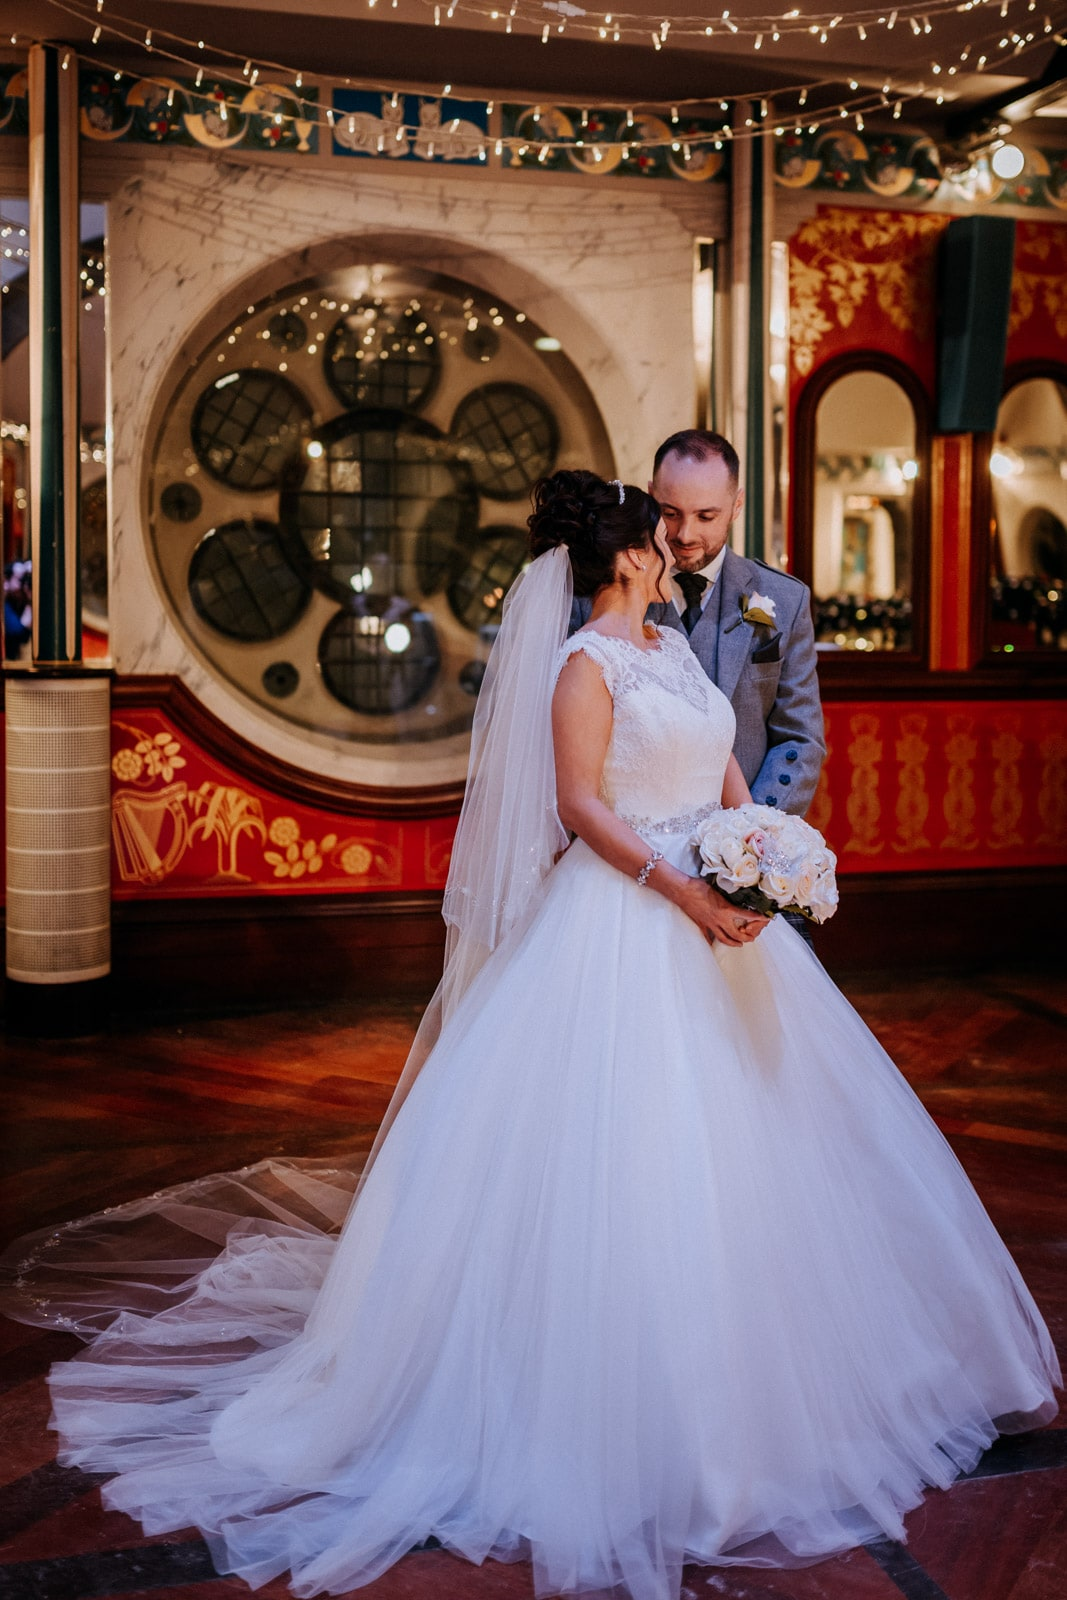 Oran-Mor-Wedding-Photographer-DearlyPhotography (29 of 55).jpg